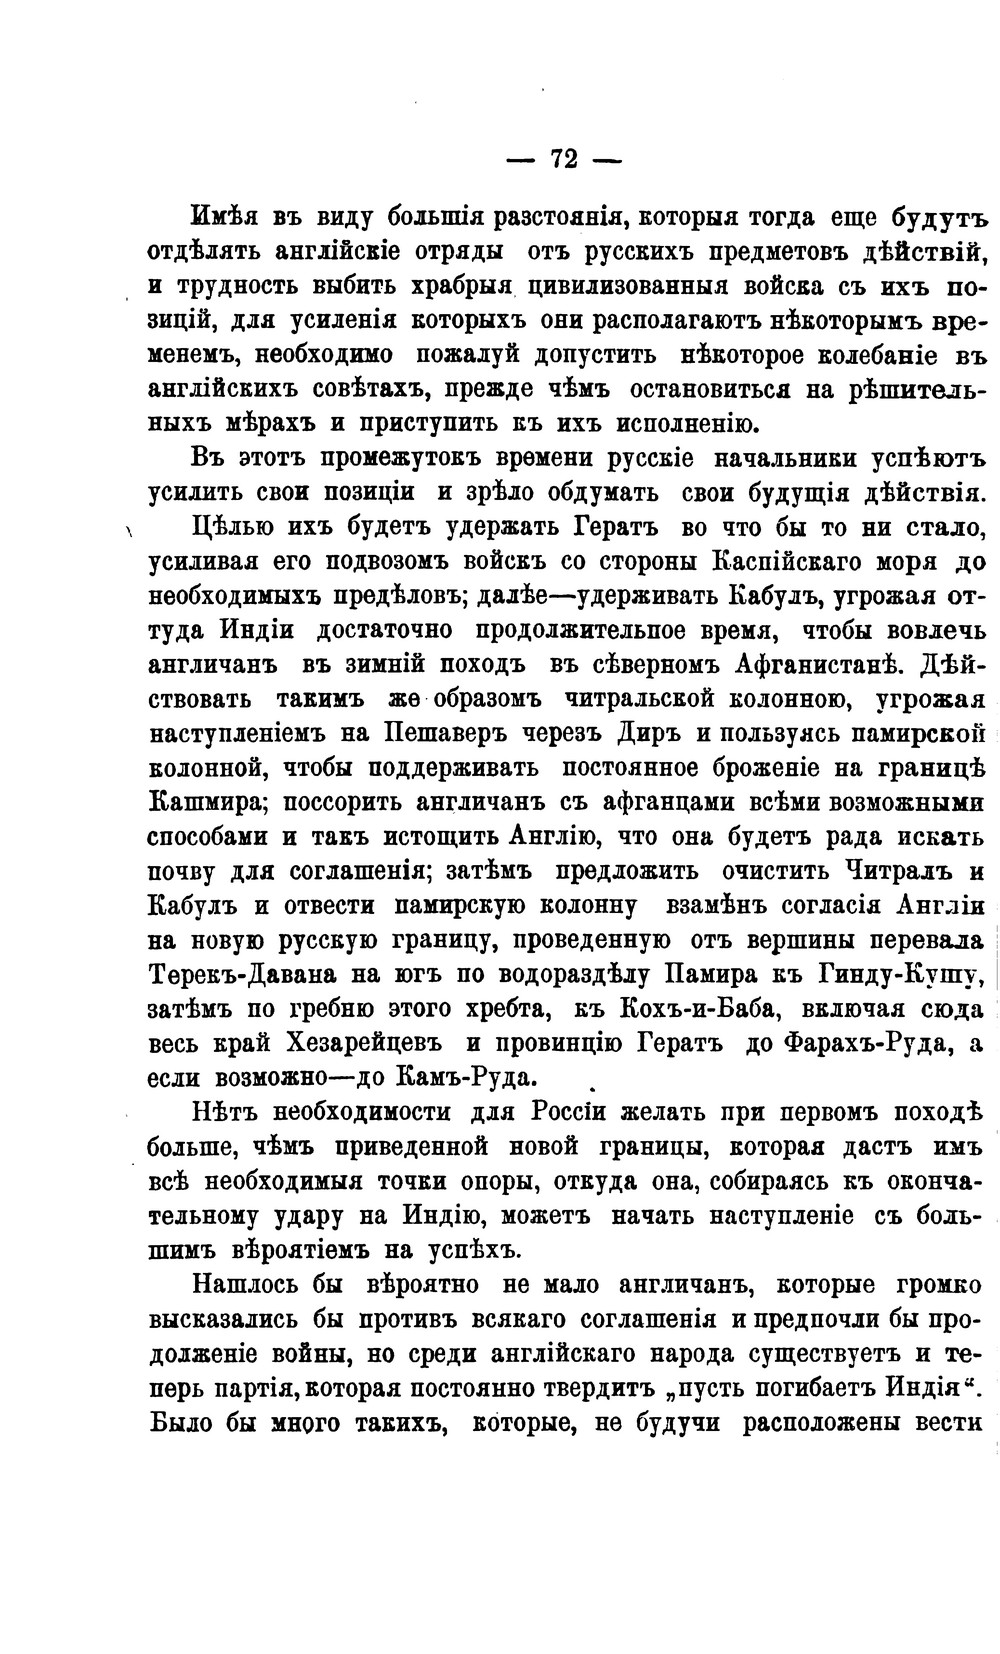 http://i1.imageban.ru/out/2013/08/29/471cbbb618e47892f7787f38d6409238.jpg